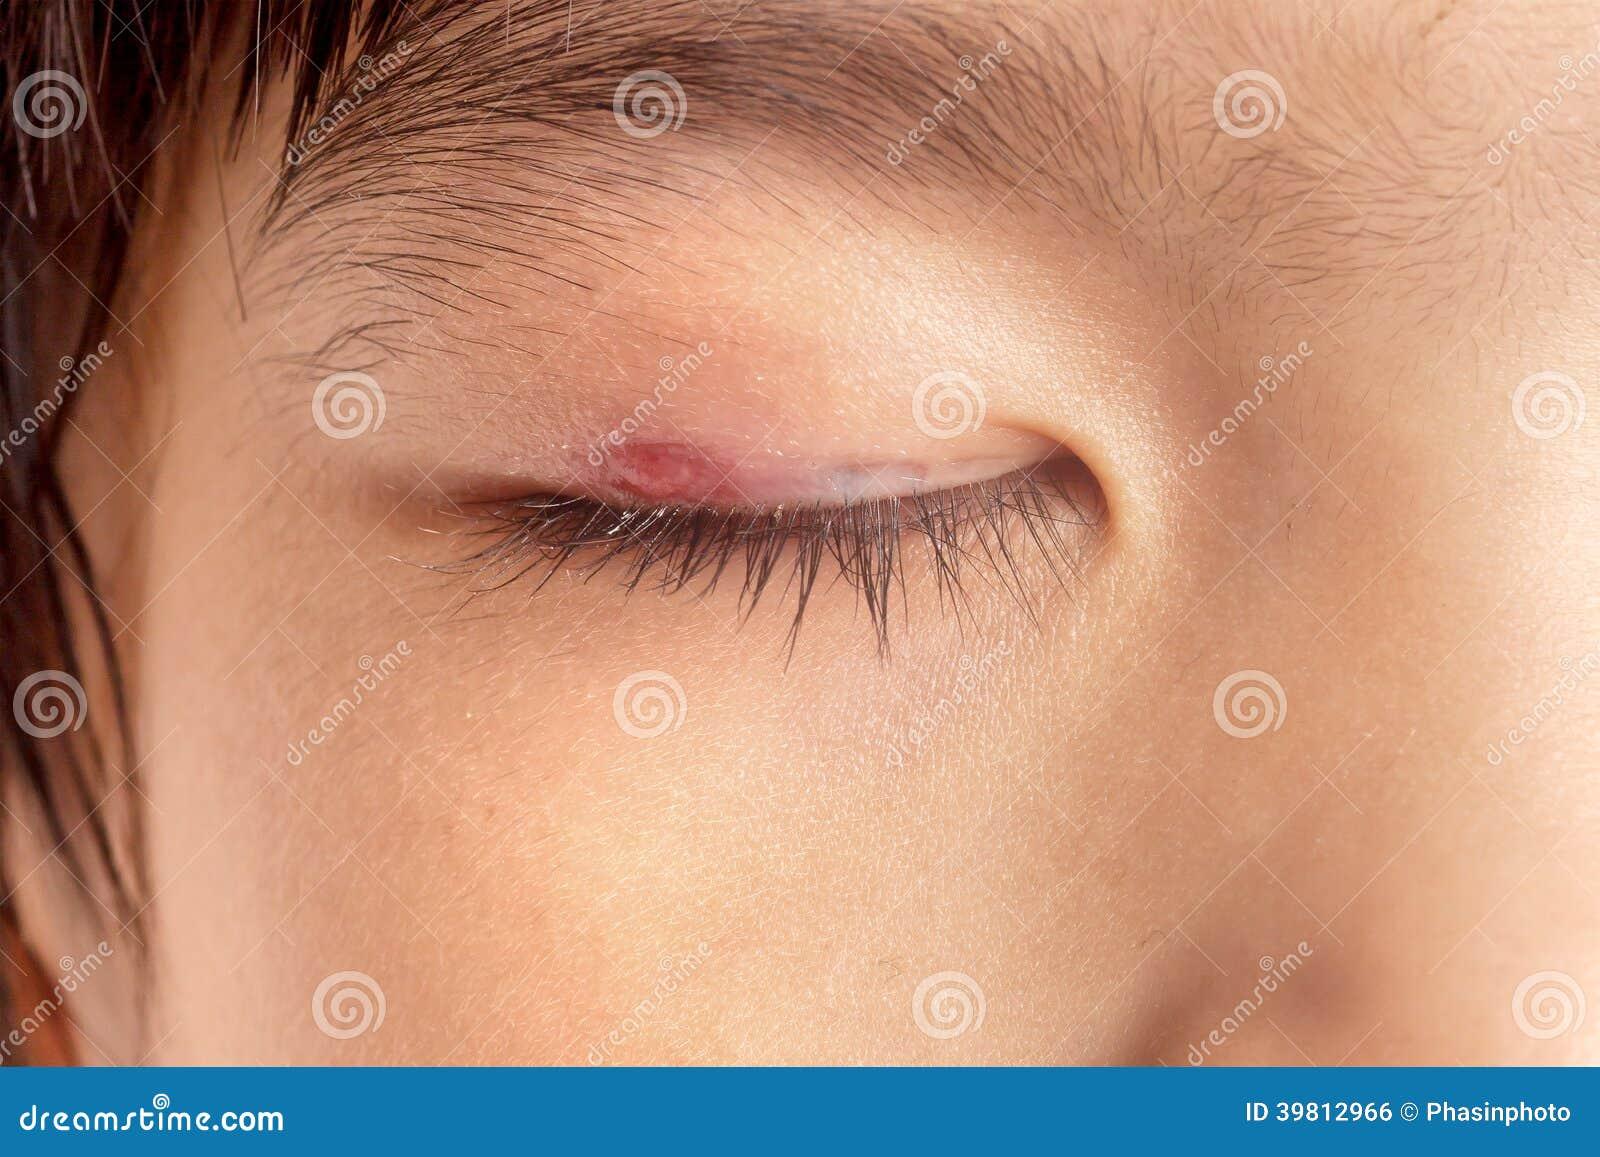 Stye oka infekcja